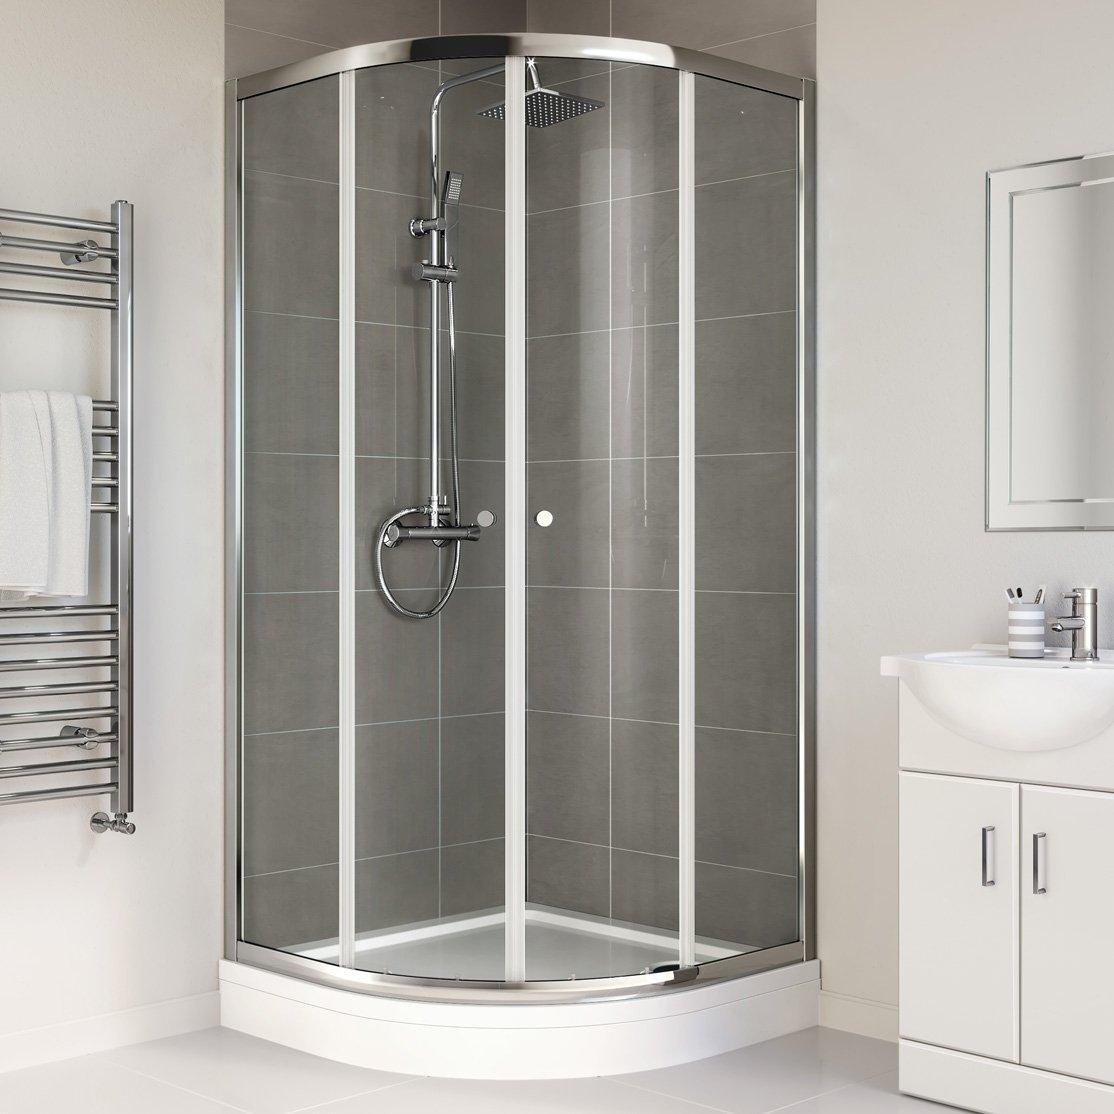 iBathUK 900 x 900 mm Designer Quadrant Sliding Door Shower Enclosure + High Tray